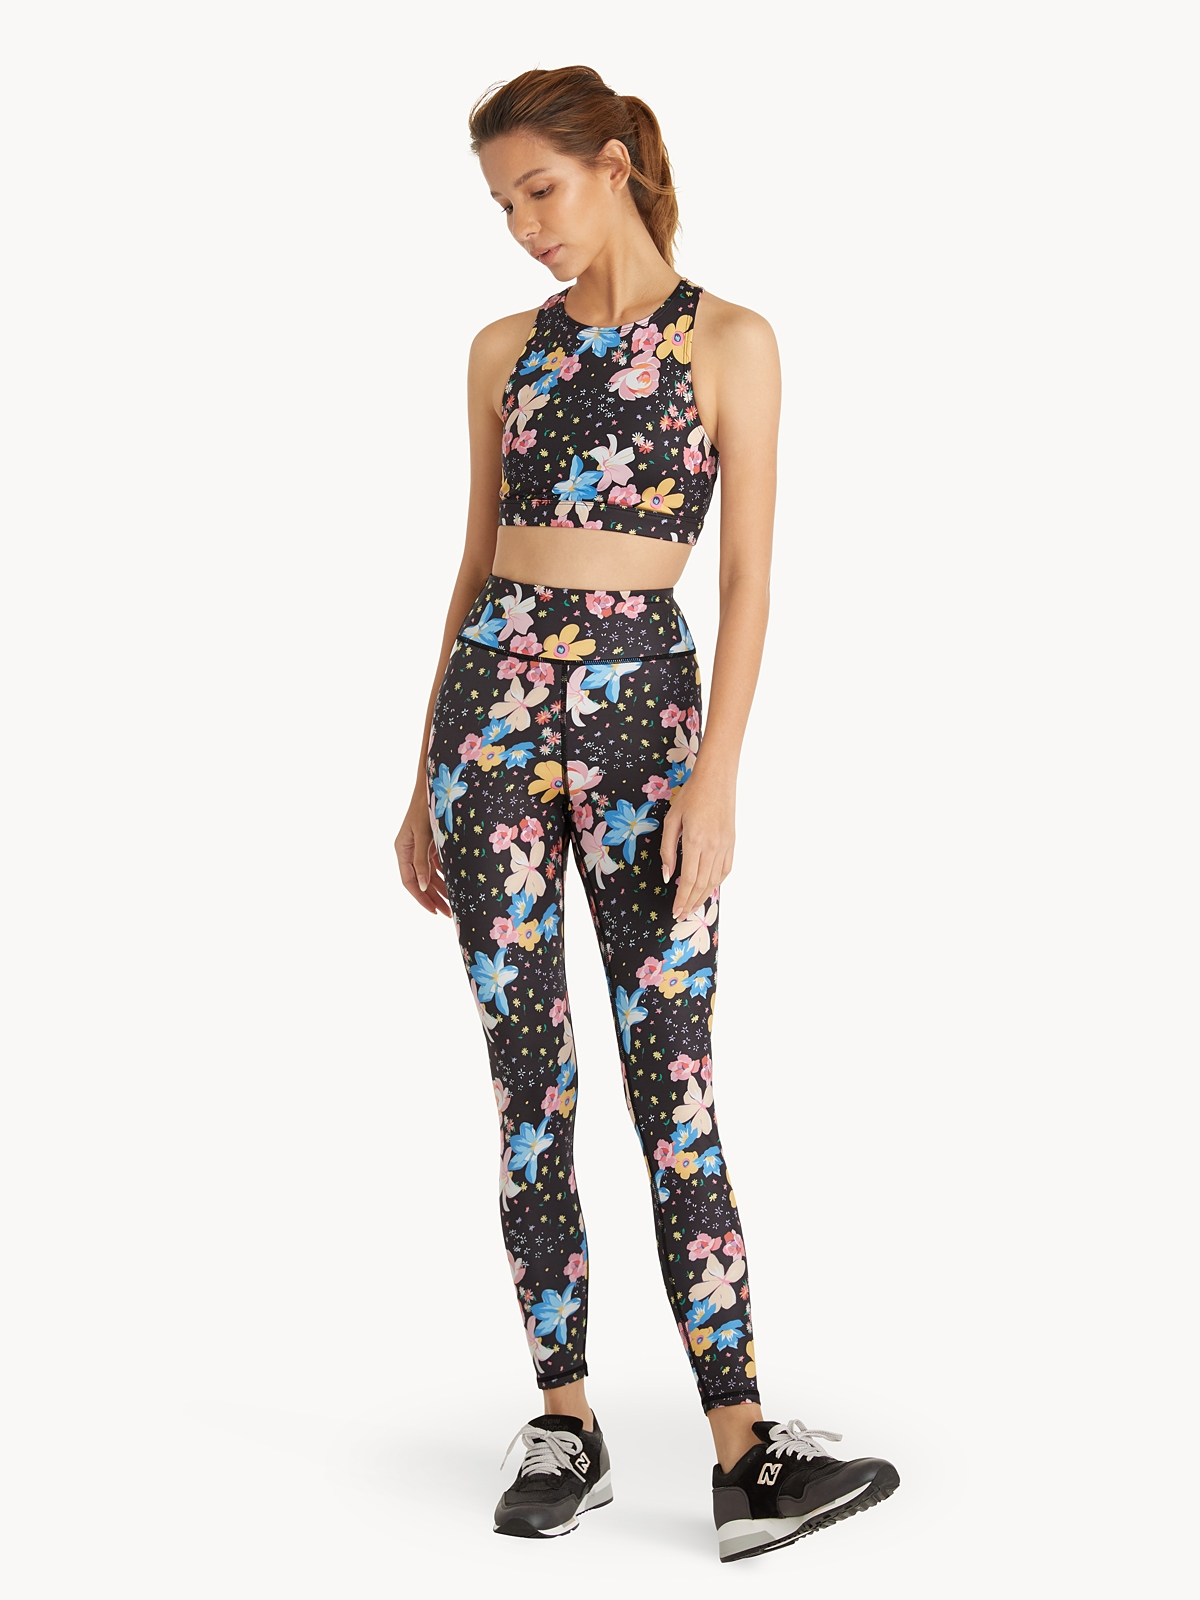 Rekomendasi Brand Sportswear Wanita